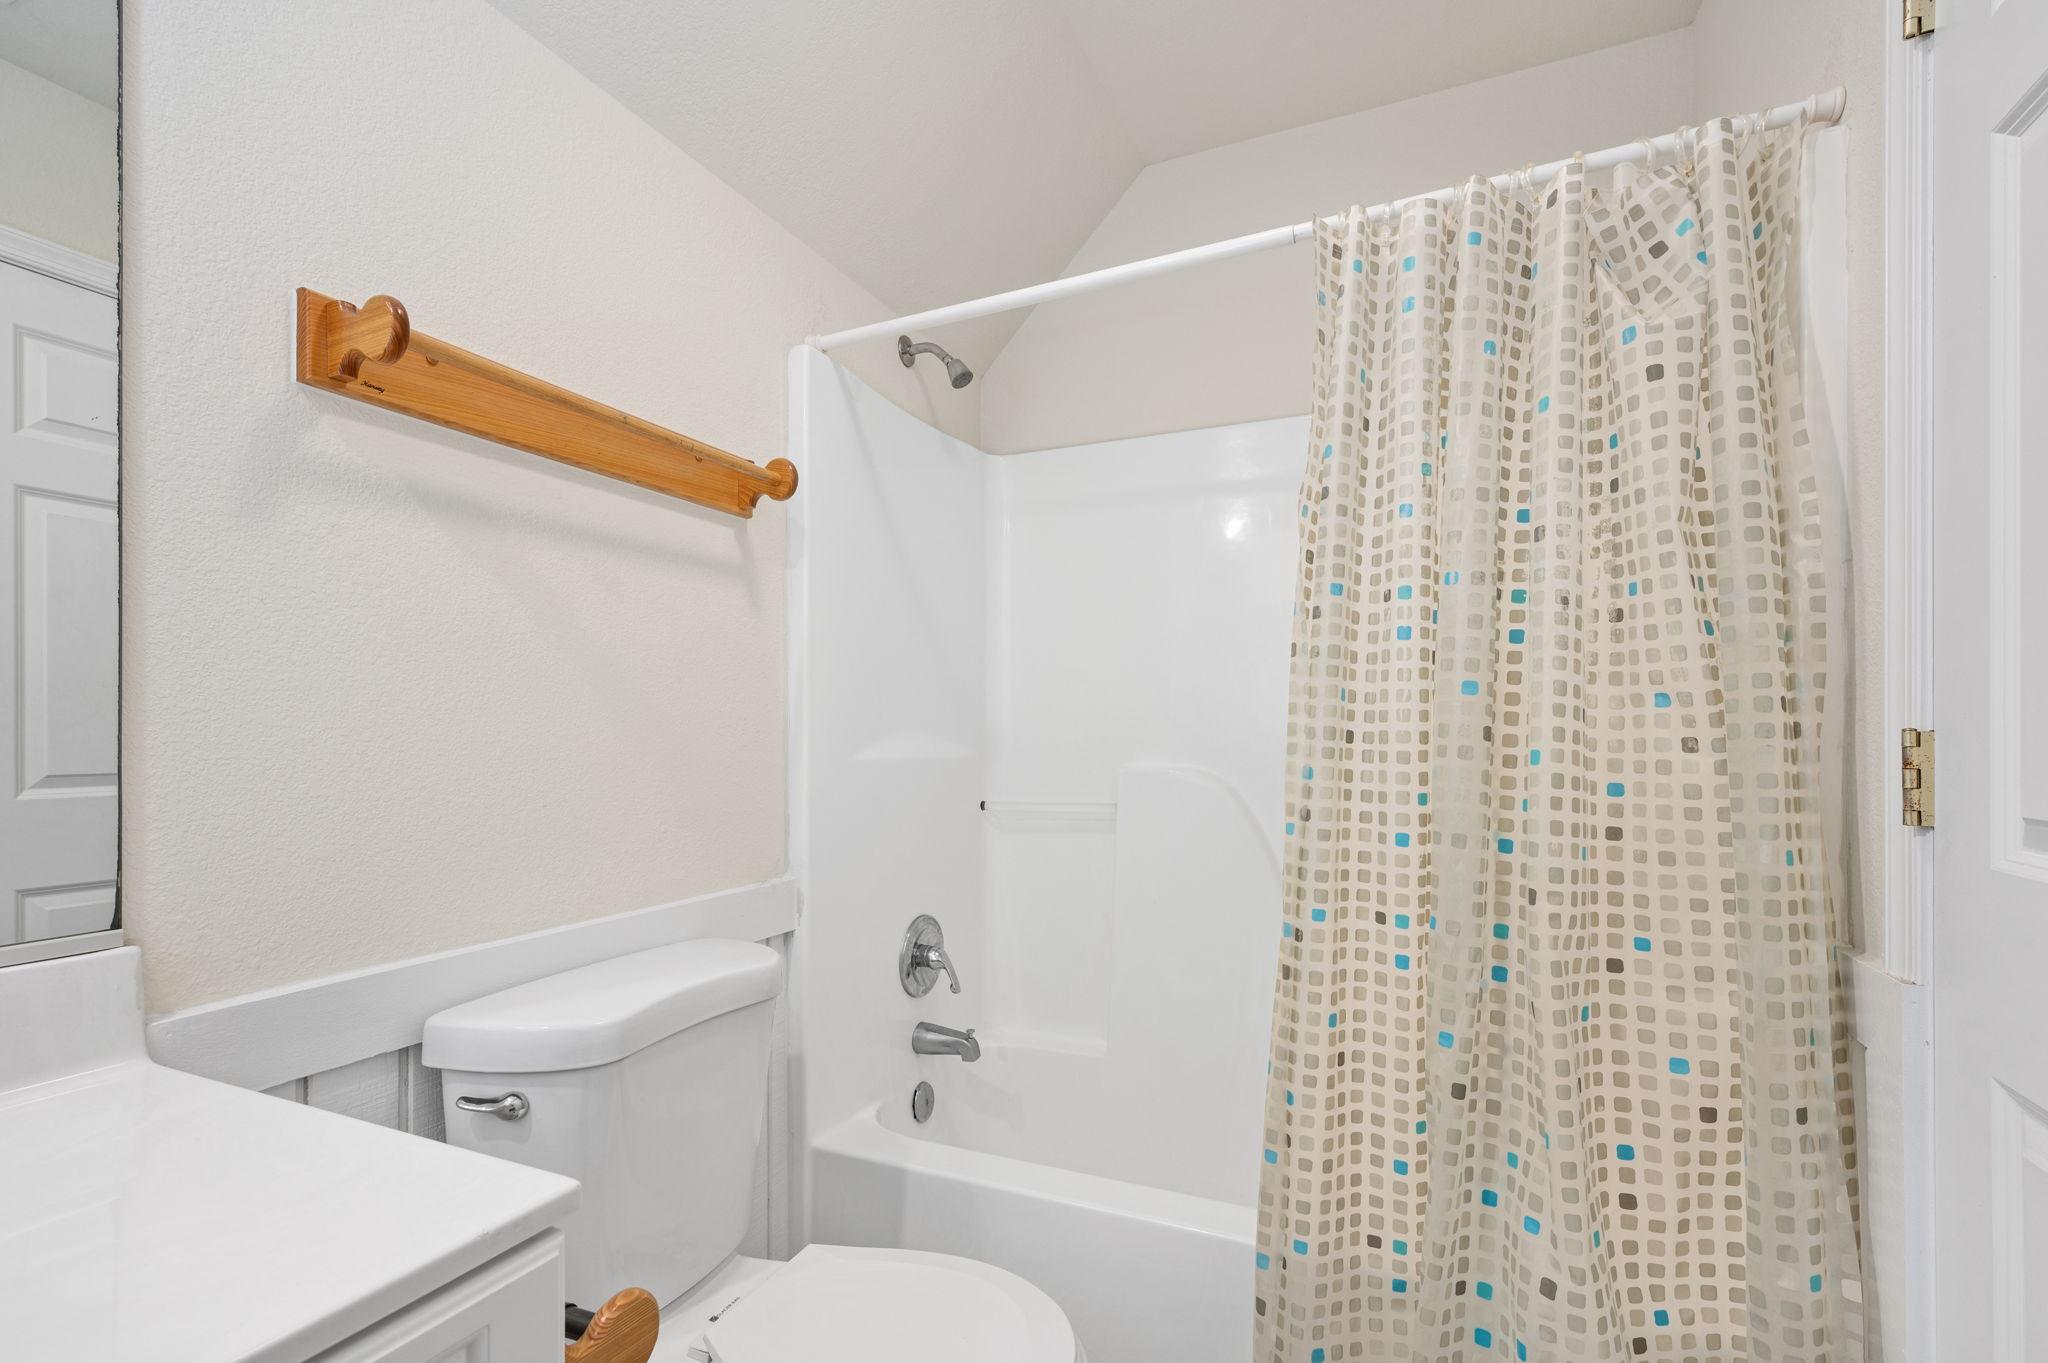 795 Mercury Road   Bottom Level Bedroom 1 - Private Bath